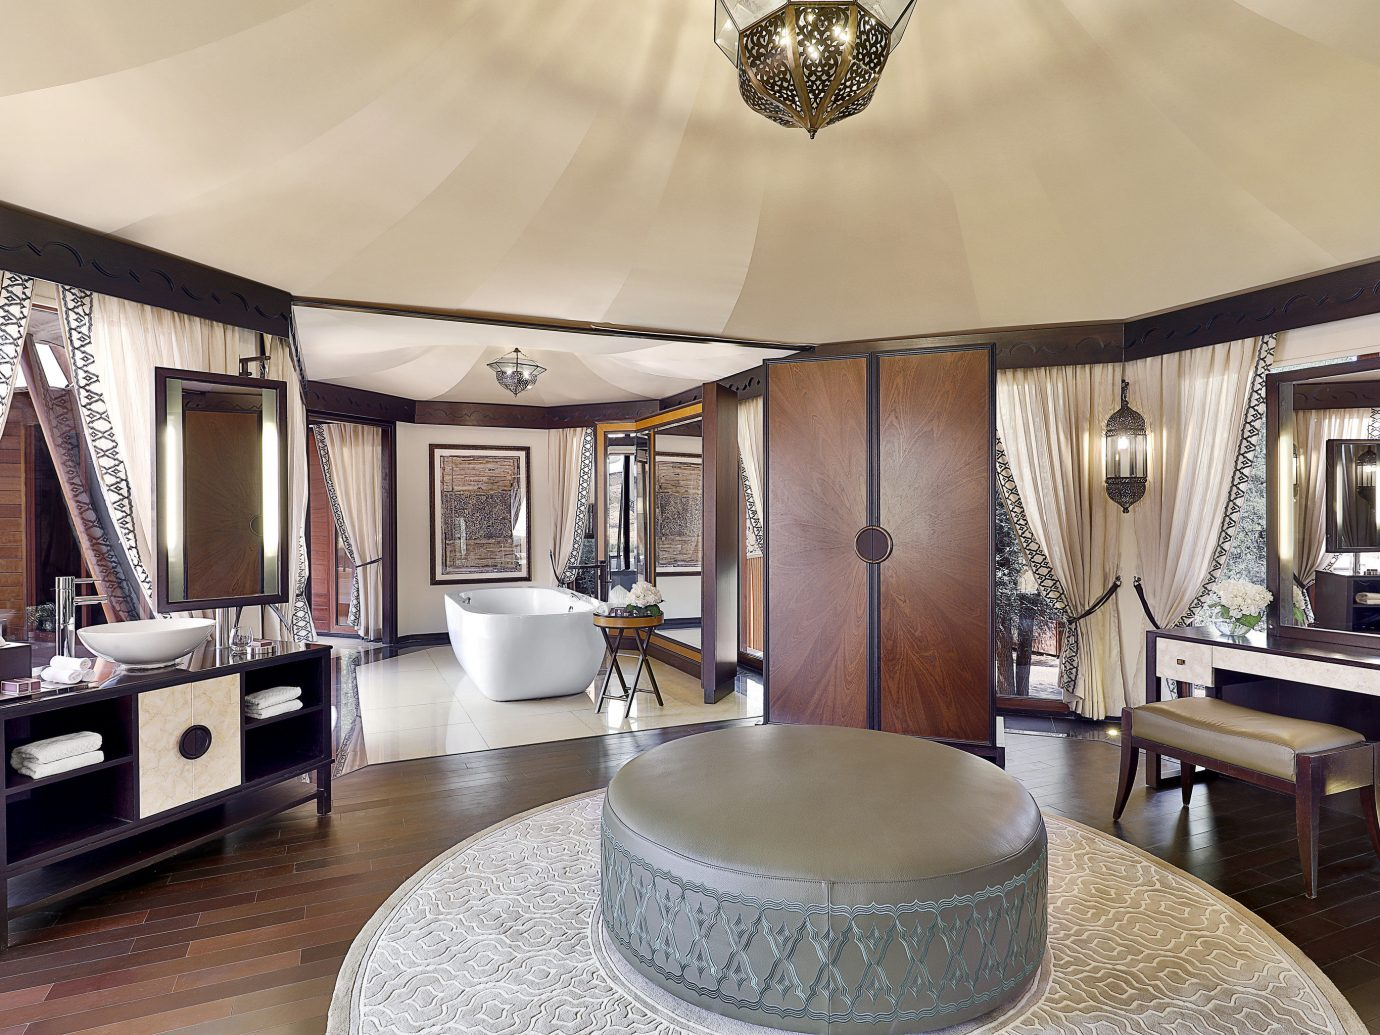 Trip Ideas indoor room floor wall Living ceiling interior design Suite furniture real estate living room estate area lamp